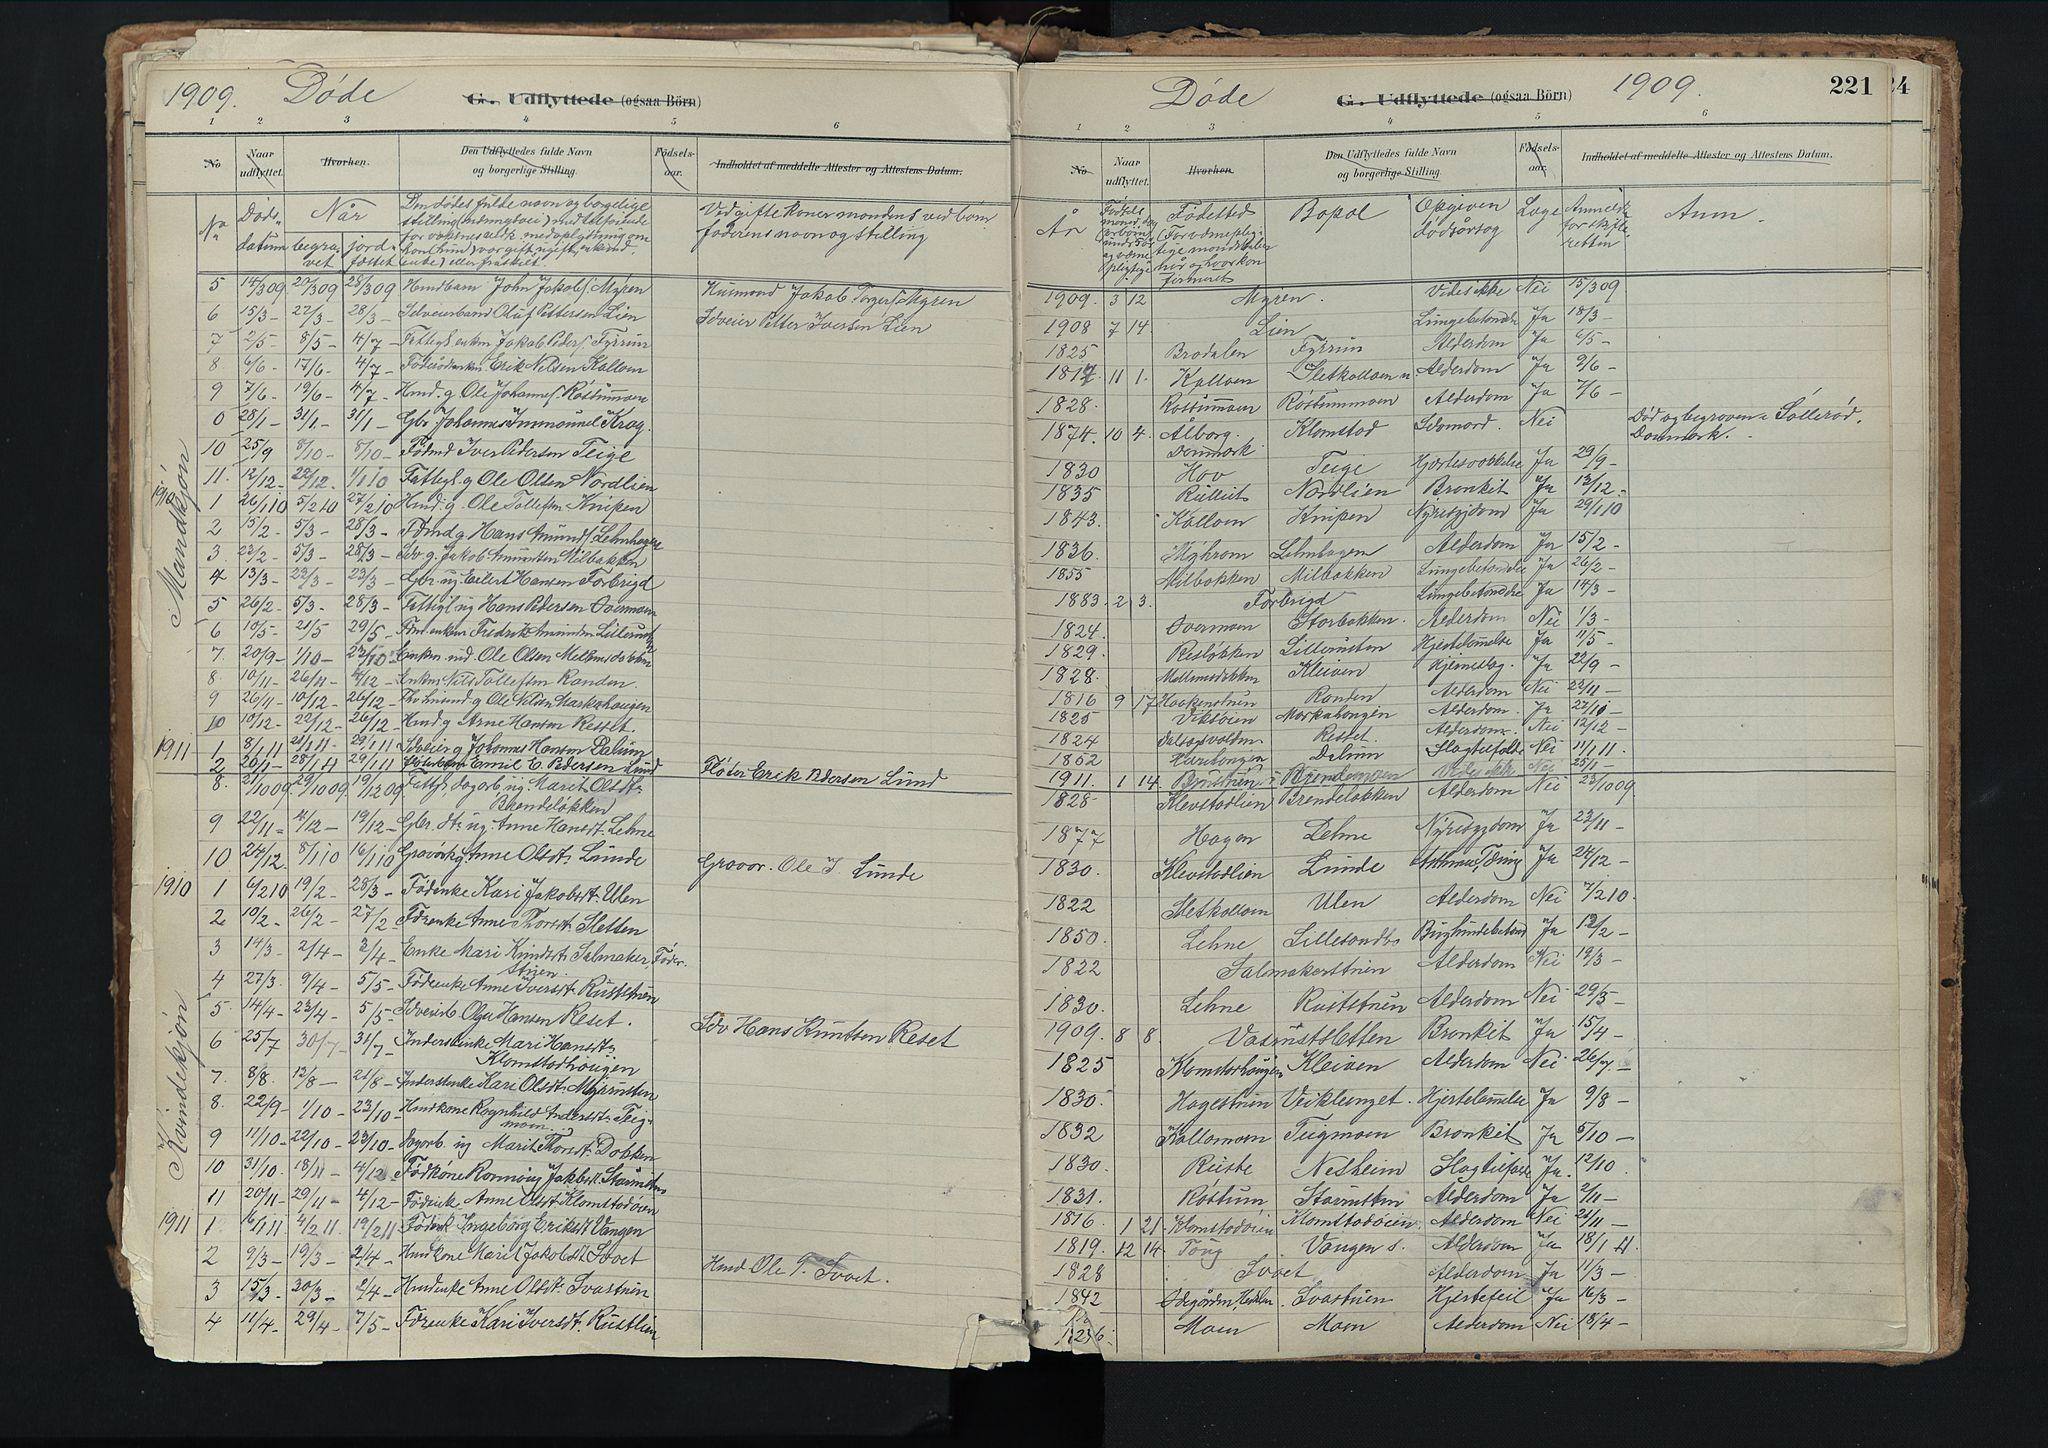 SAH, Nord-Fron prestekontor, Ministerialbok nr. 3, 1884-1914, s. 221